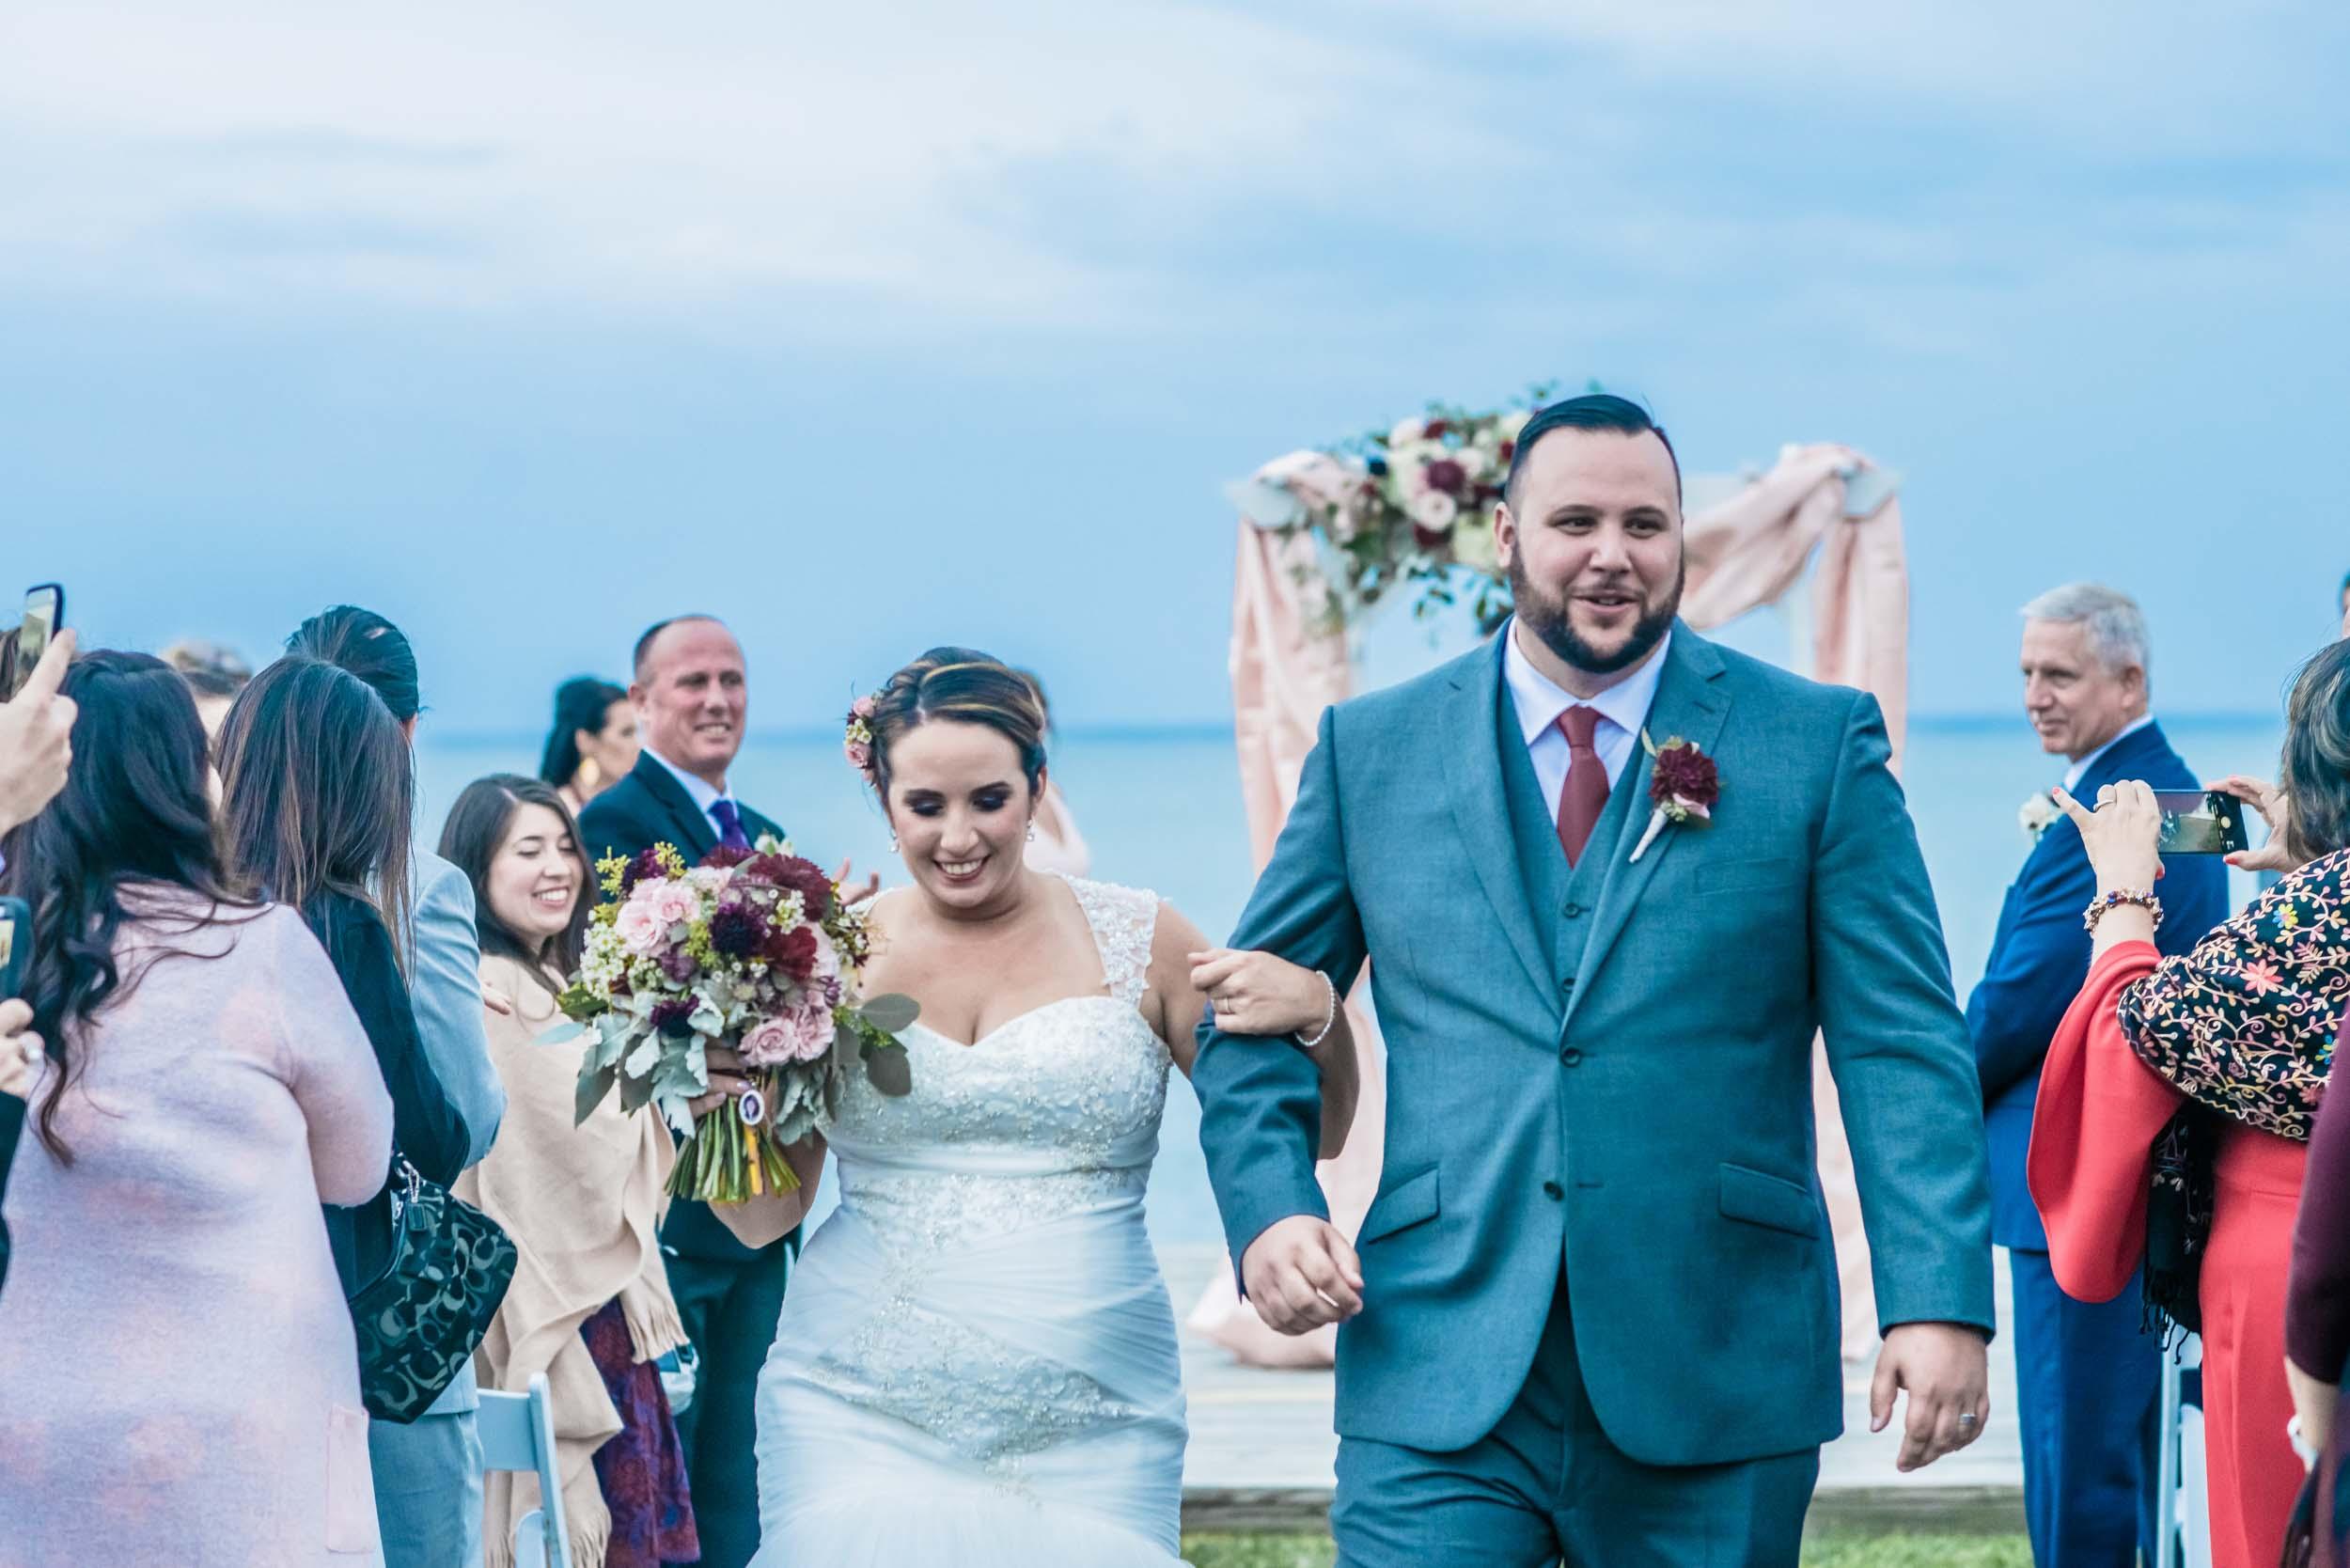 dc+metro+wedding+photographer+vadym+guliuk+photography+wedding+ceremony-2042.jpg